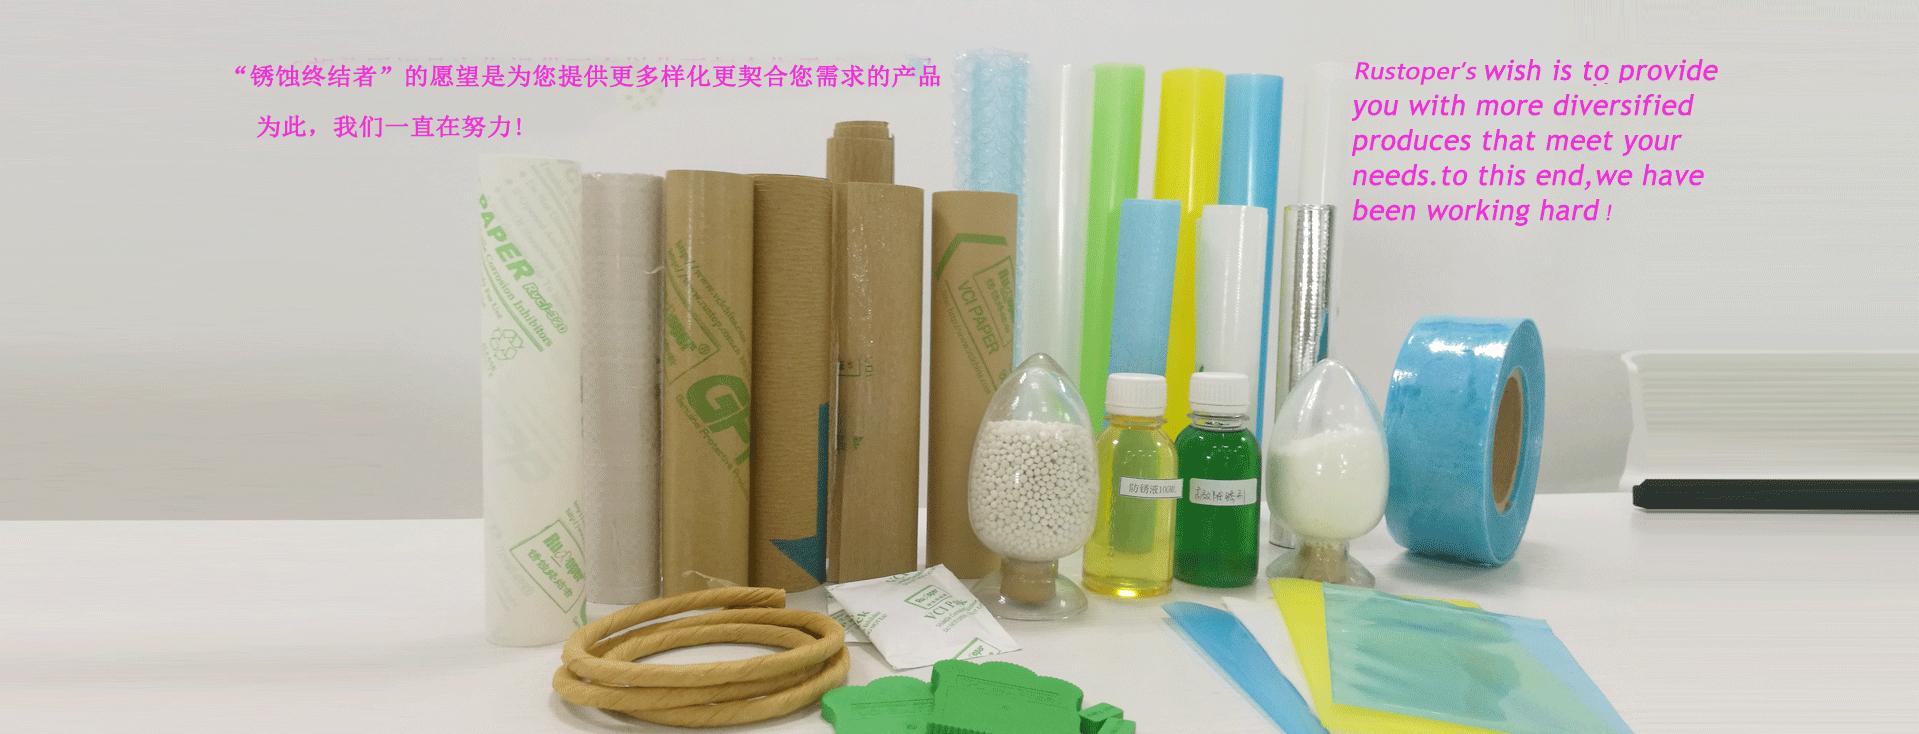 VCI 产品